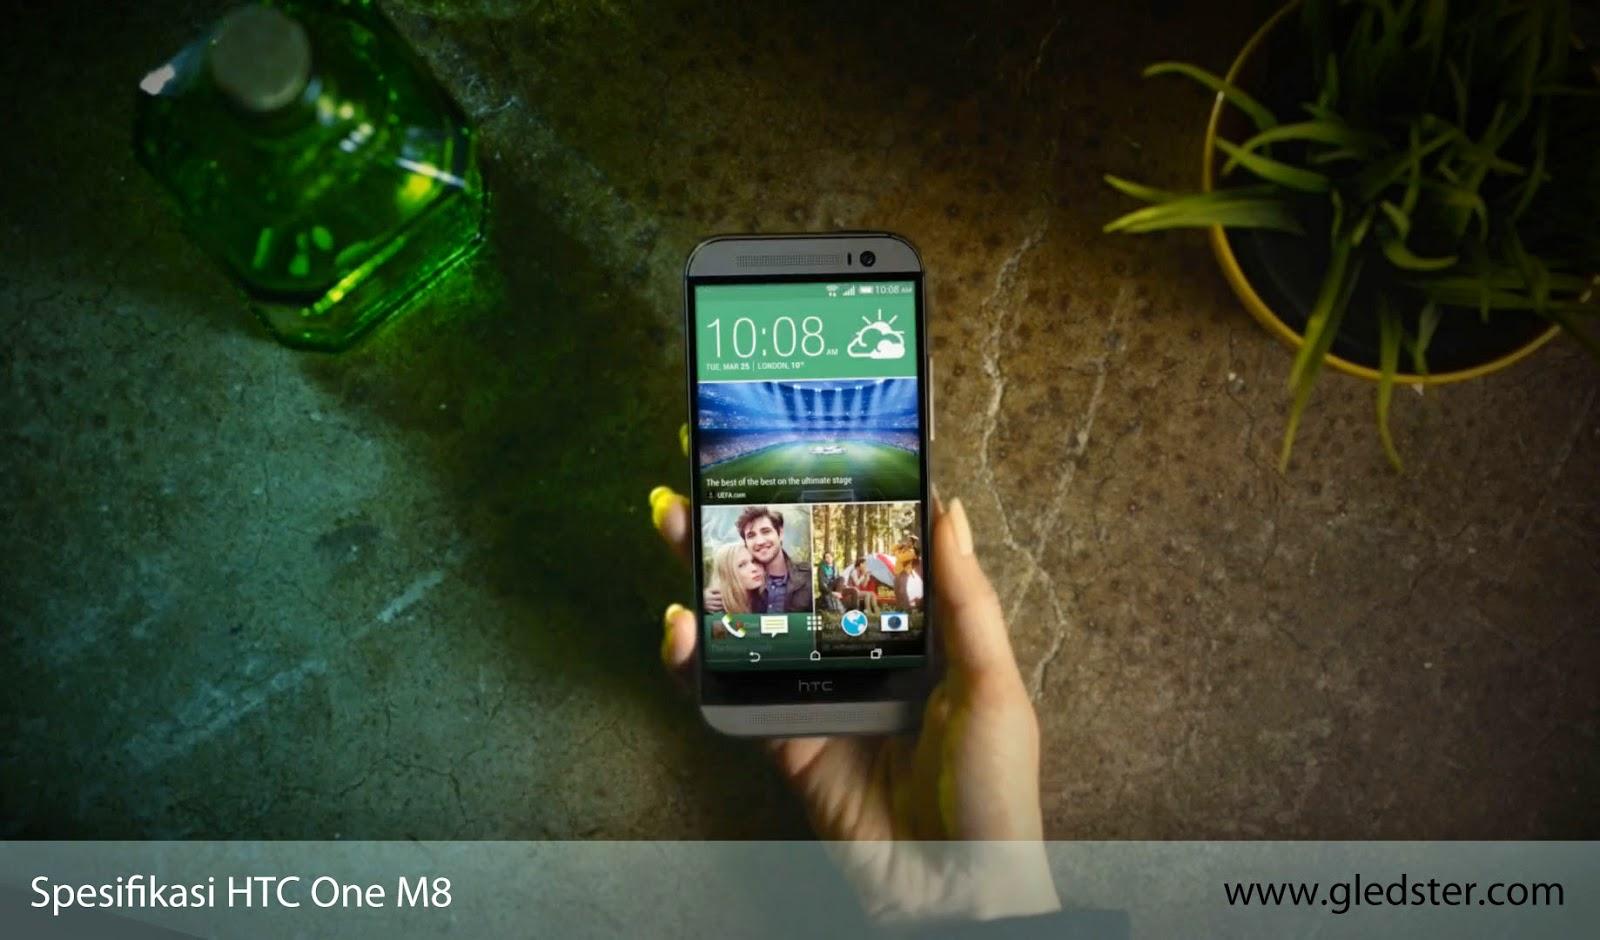 Spesifikasi HTC One M8